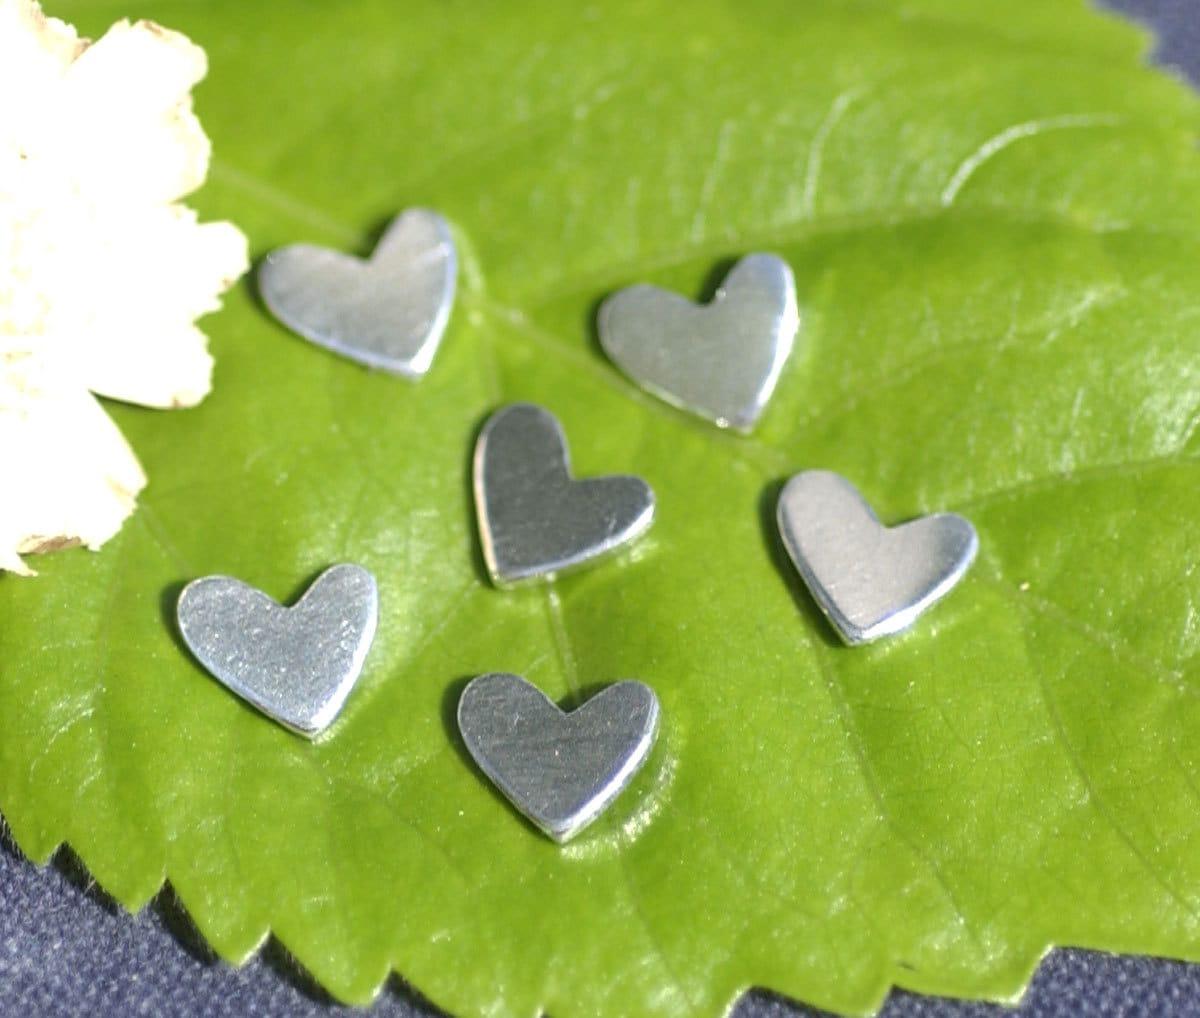 Nickel Silver Tiny Lopsided Heart 7mm X 6mm 20g Metal